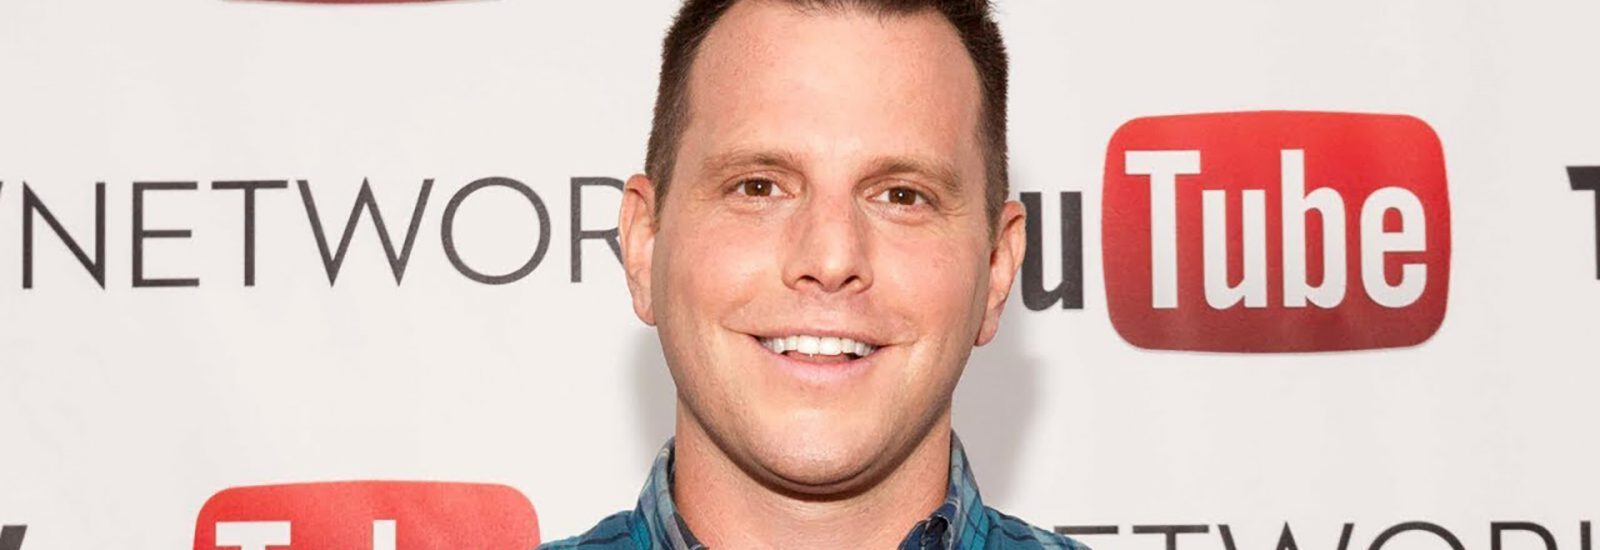 Youtuber Dave Rubin Admits He's Open to Jesus